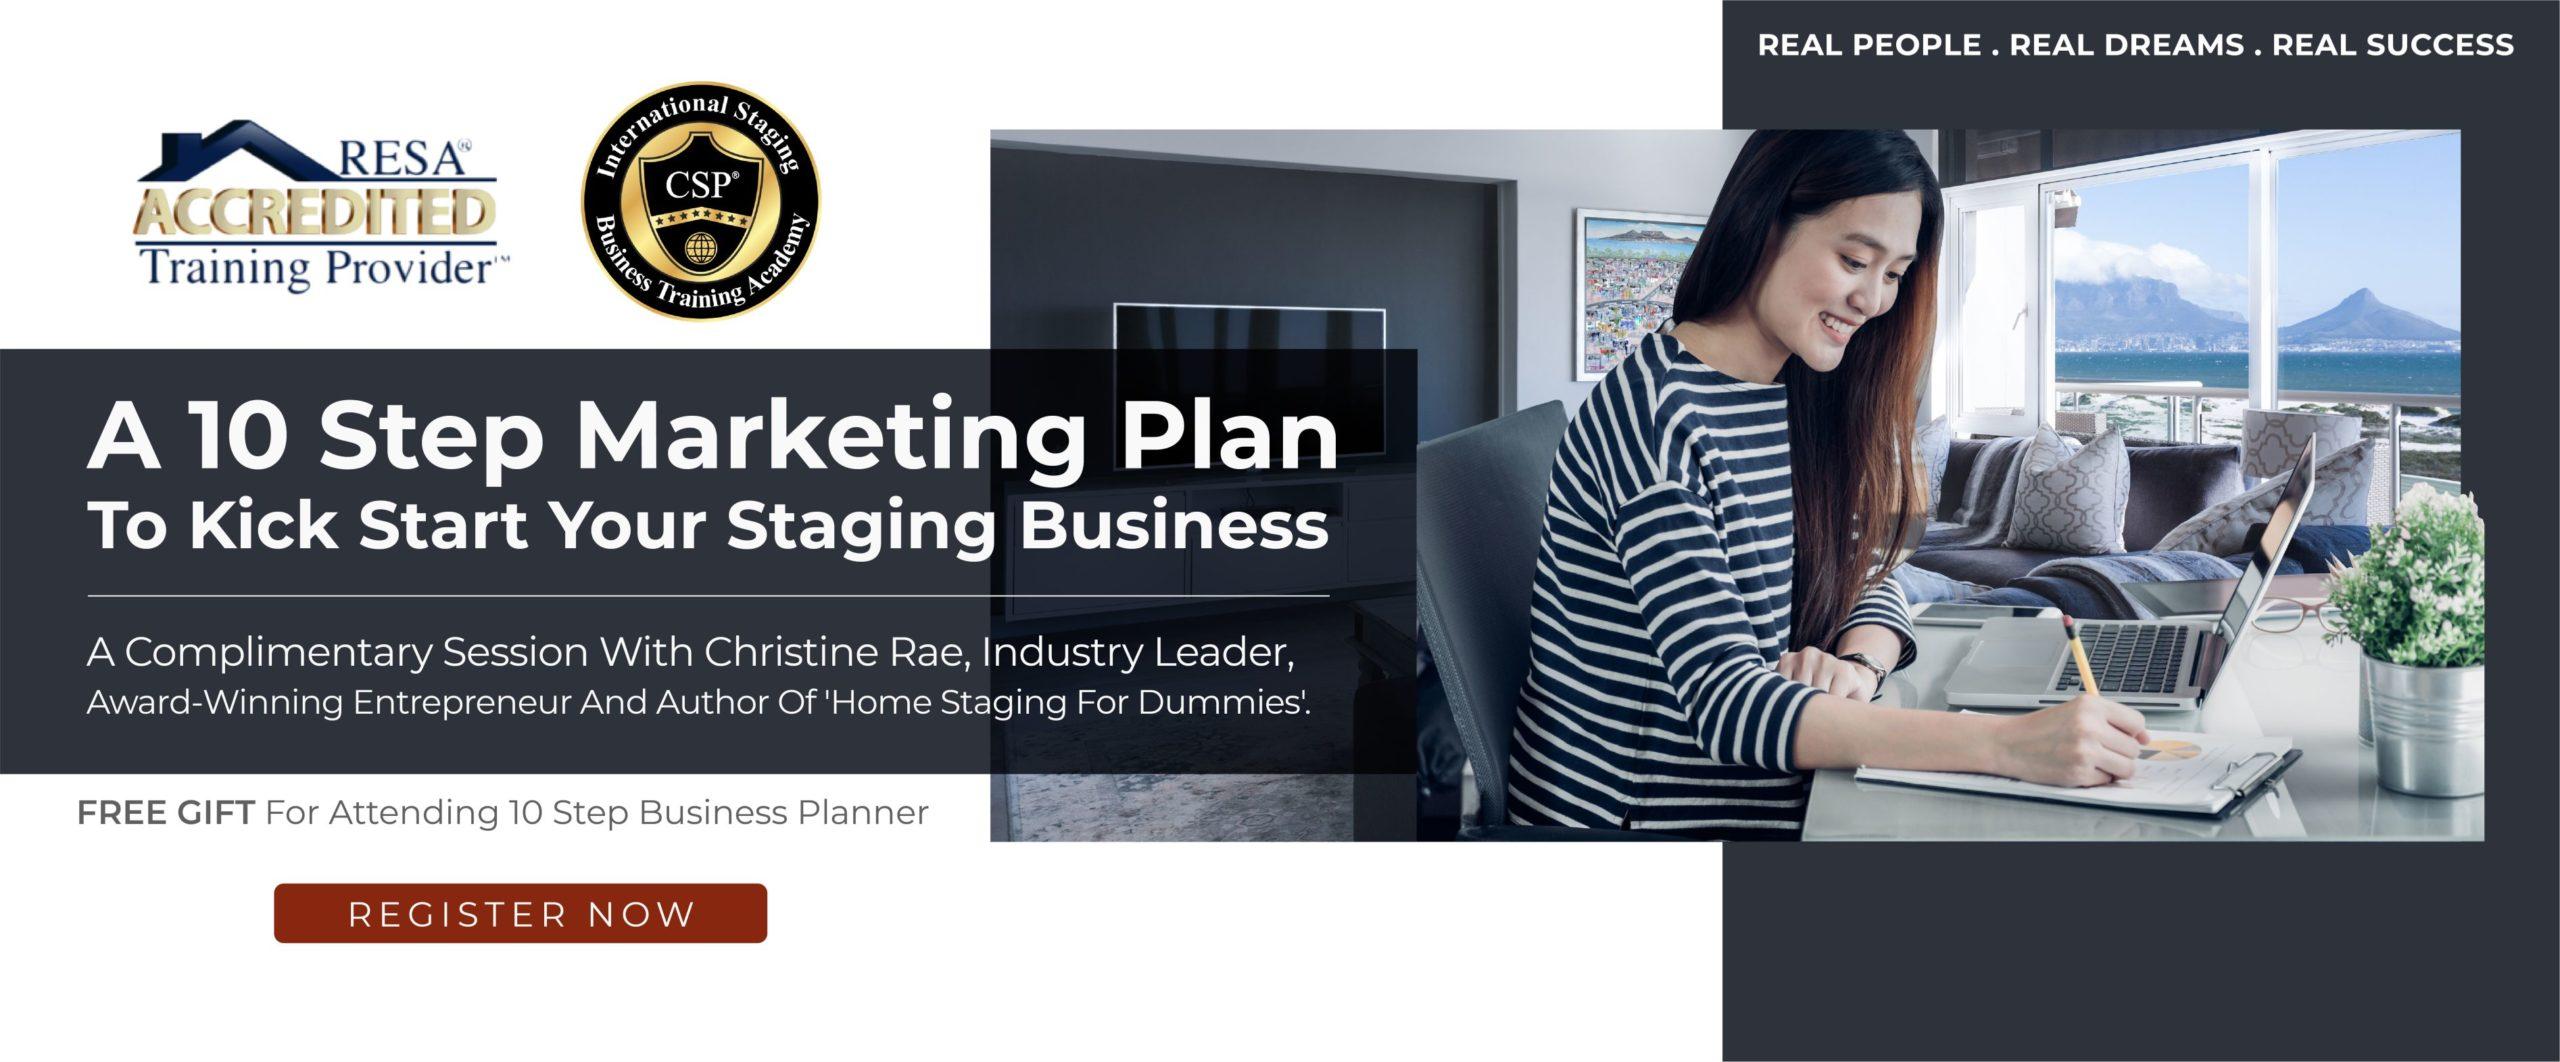 10 step home staging marketing plan webinar